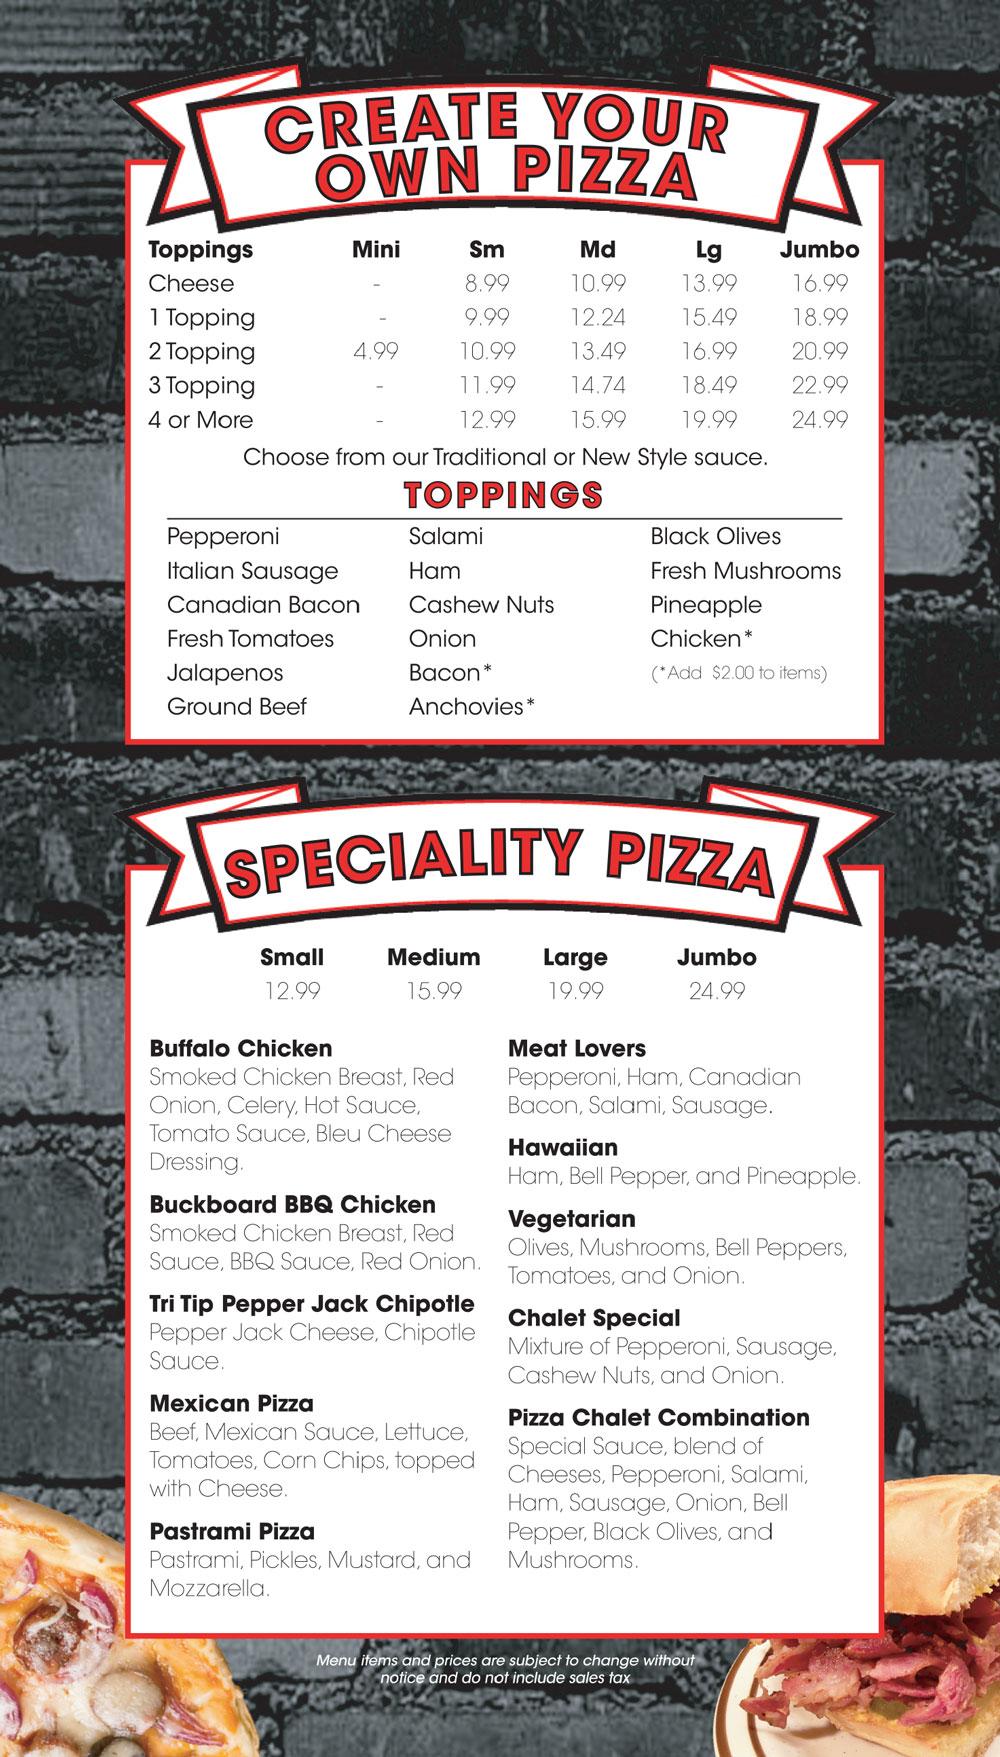 pizza-chalet-menu-inside-print-7-20-16-2